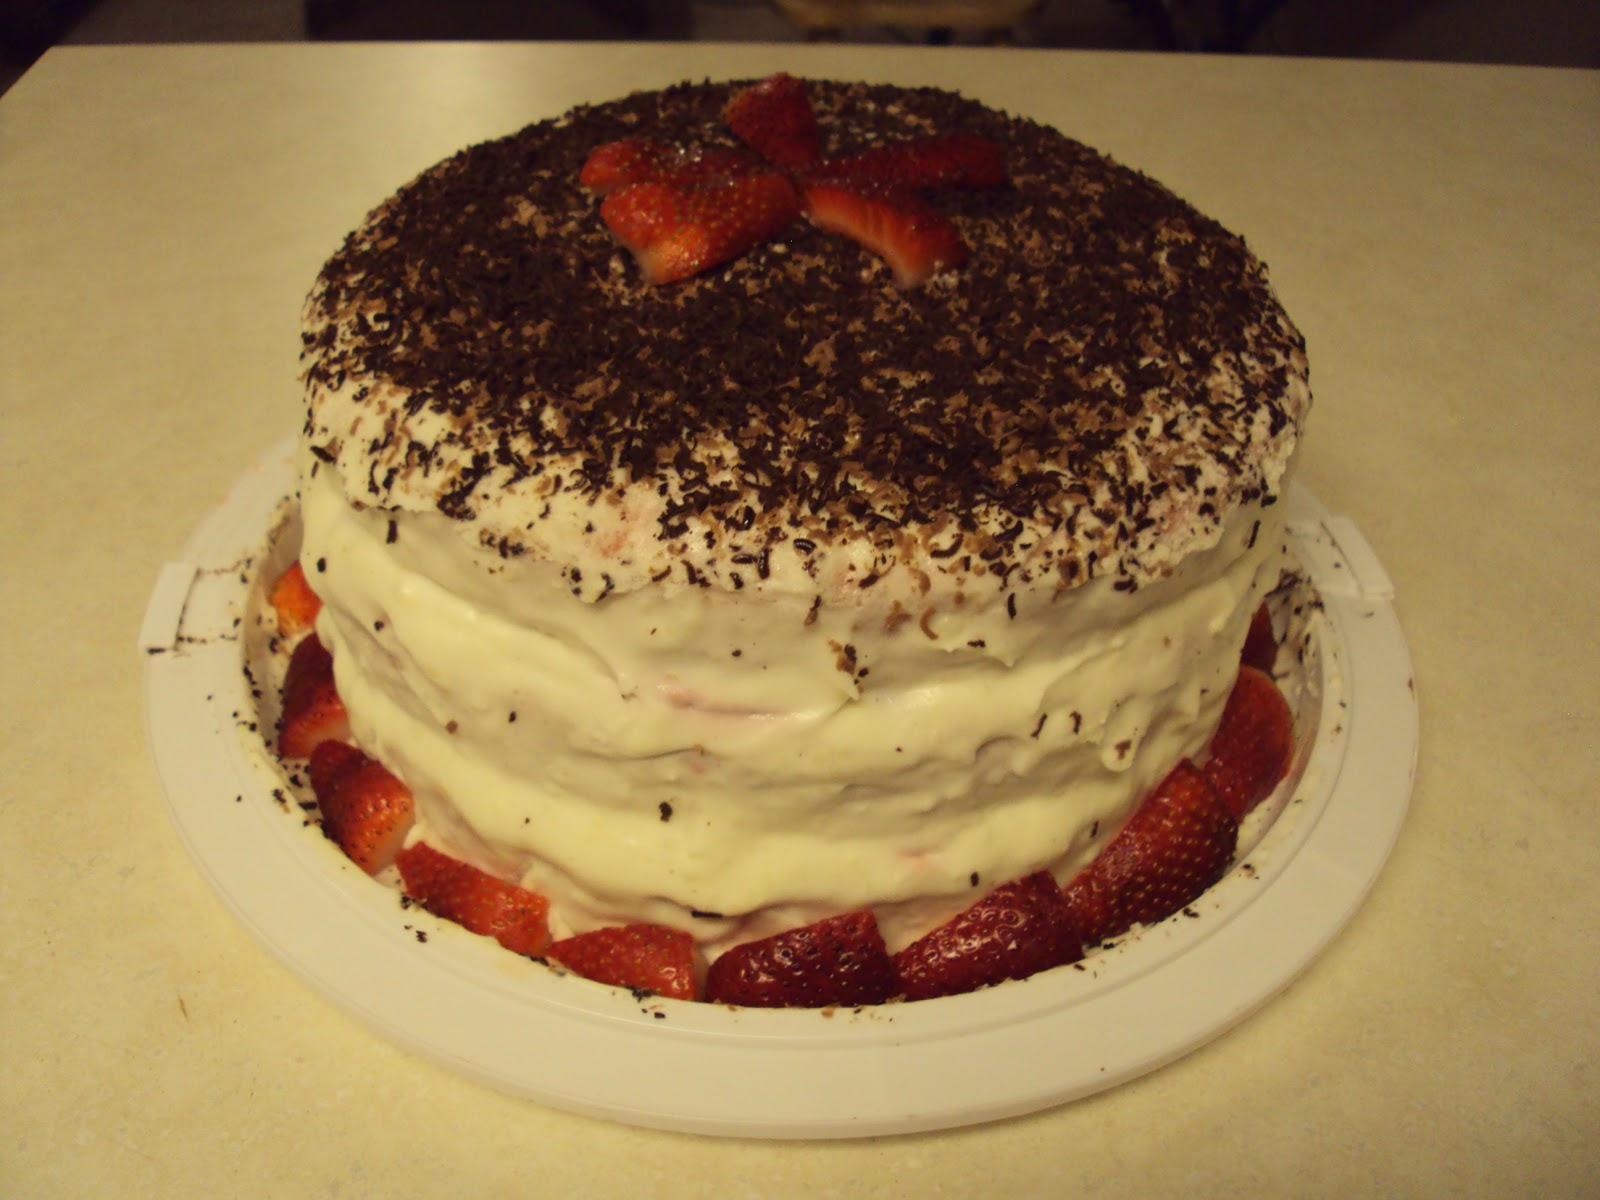 Caribou Classics: Strawberry Cream White Chocolate Cake